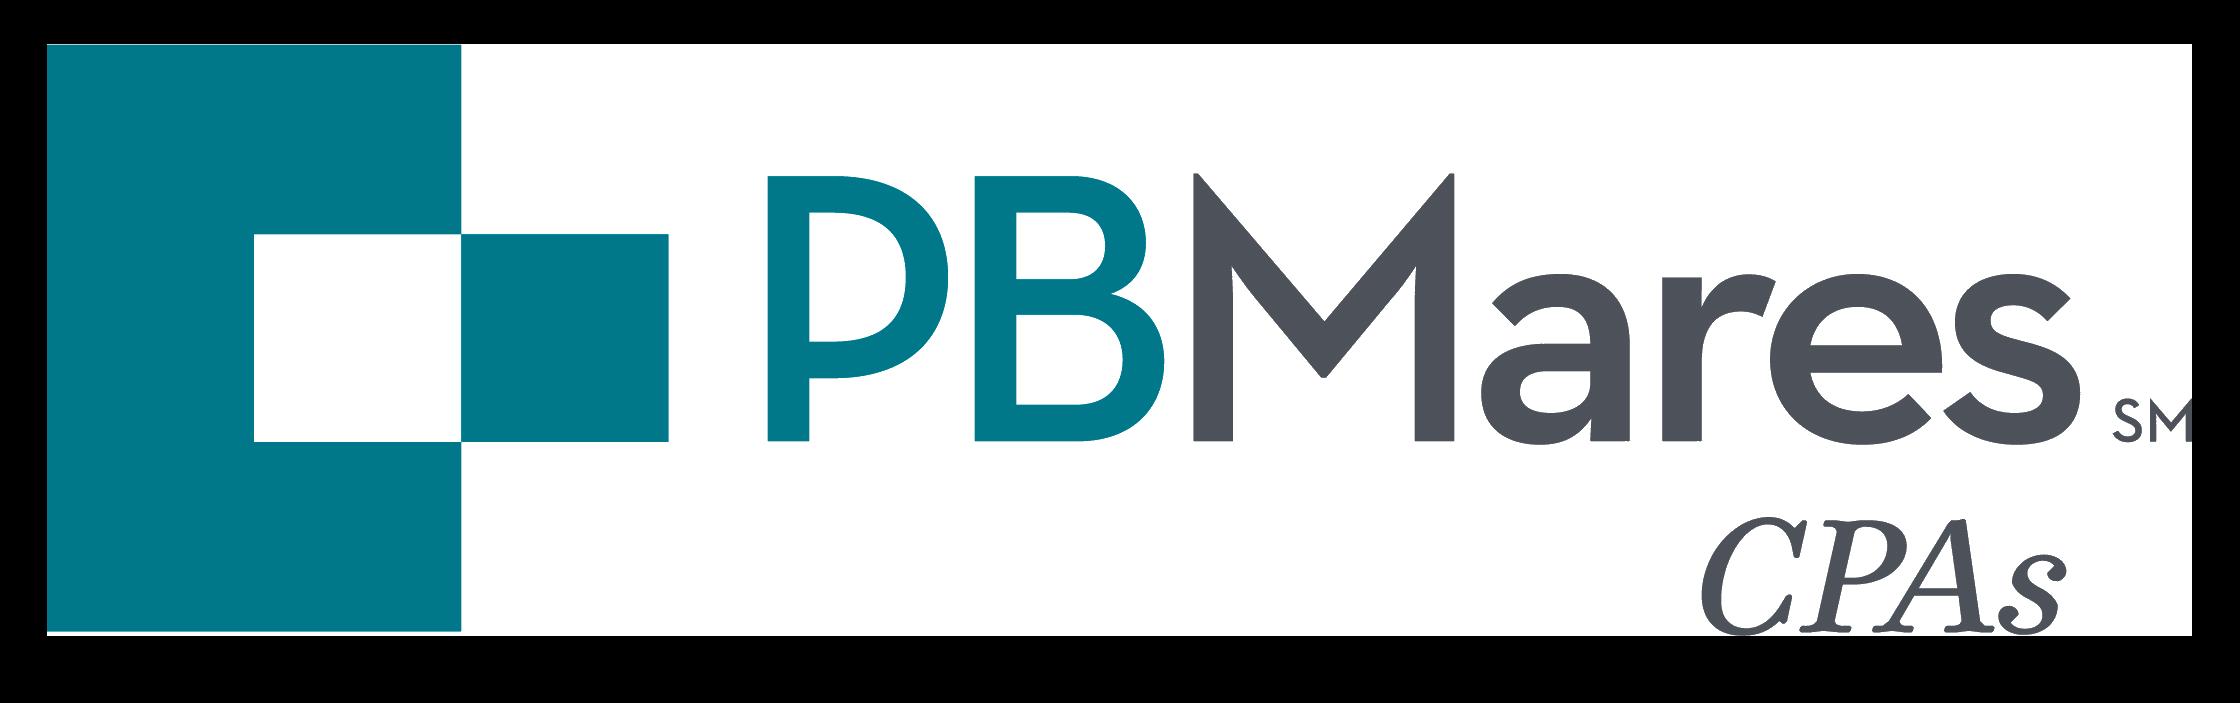 PBMares, LLC logo